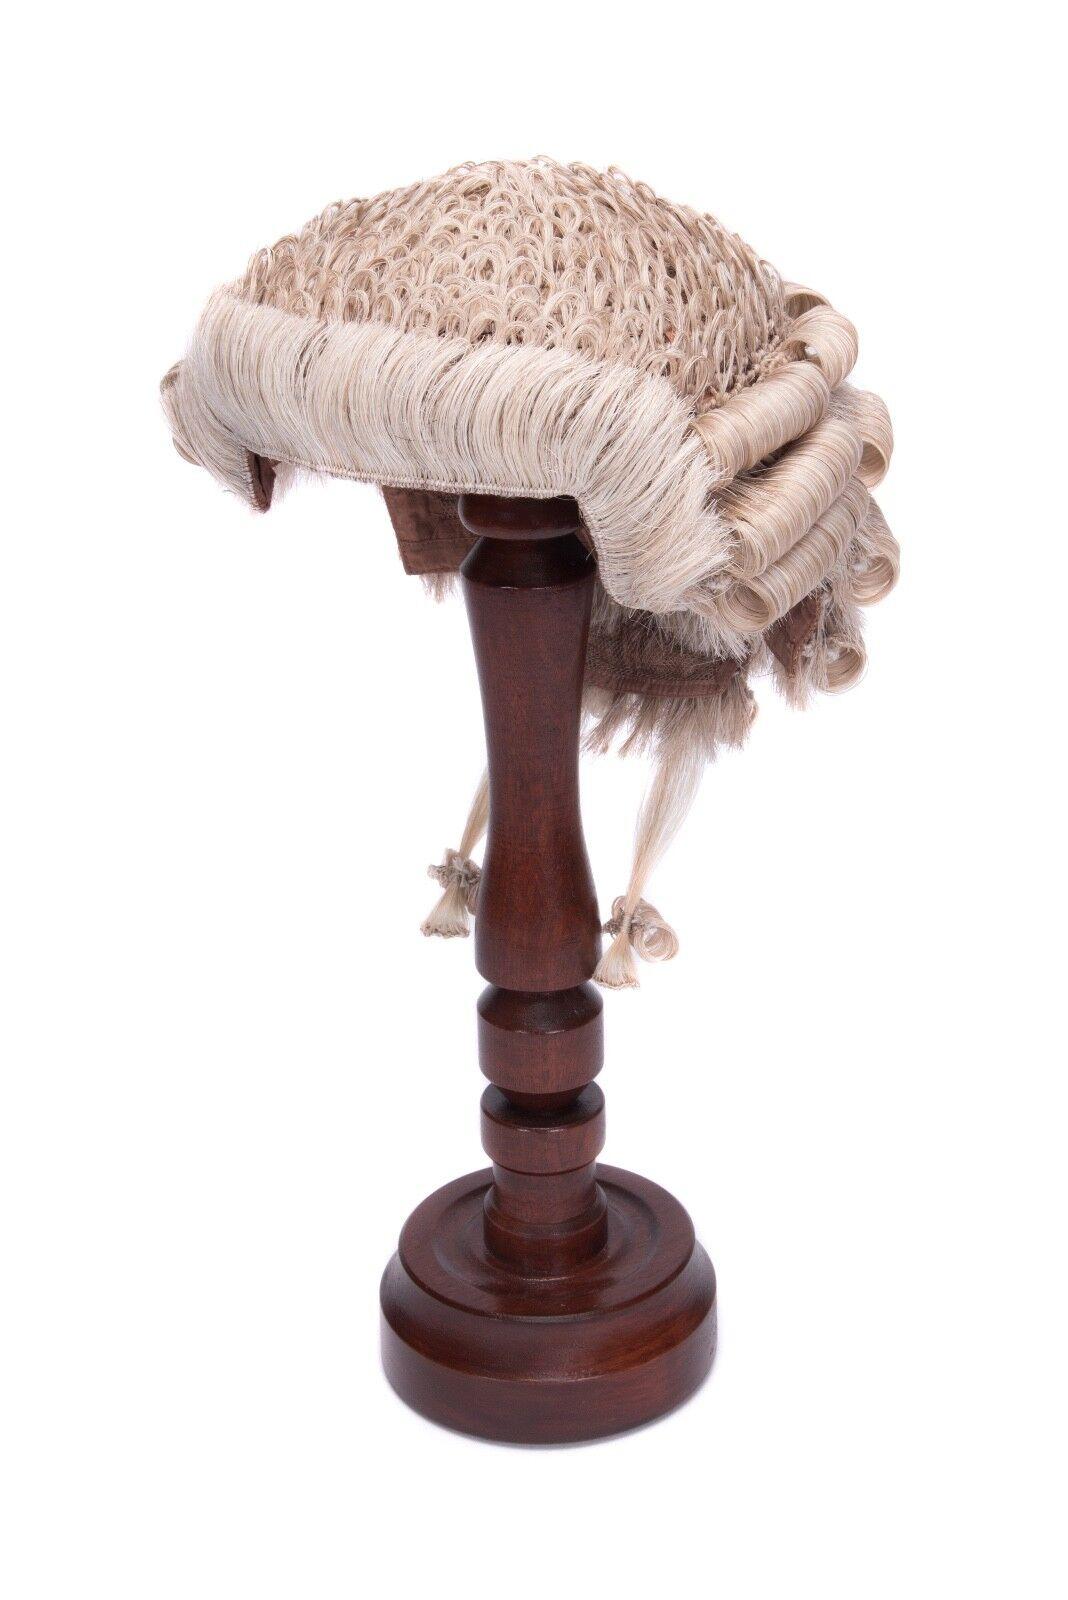 Illuminez le cadeau de Noël en Irak. Traditional Barristers Perruque-Gris/Blanc-Handmade Perruque-Gris/Blanc-Handmade Perruque-Gris/Blanc-Handmade in Brit 56c659